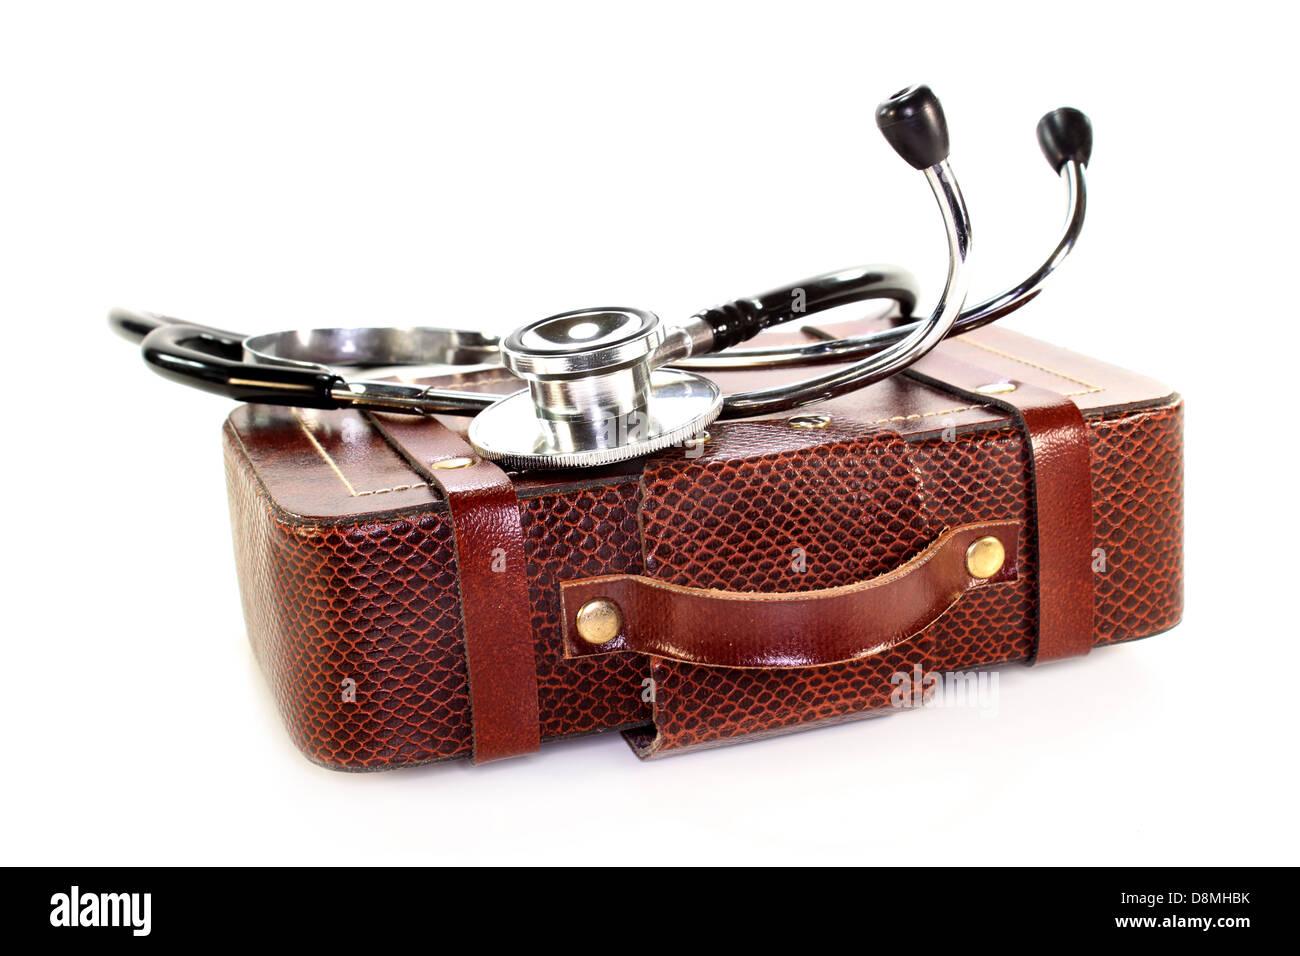 Travel health insurance - Stock Image